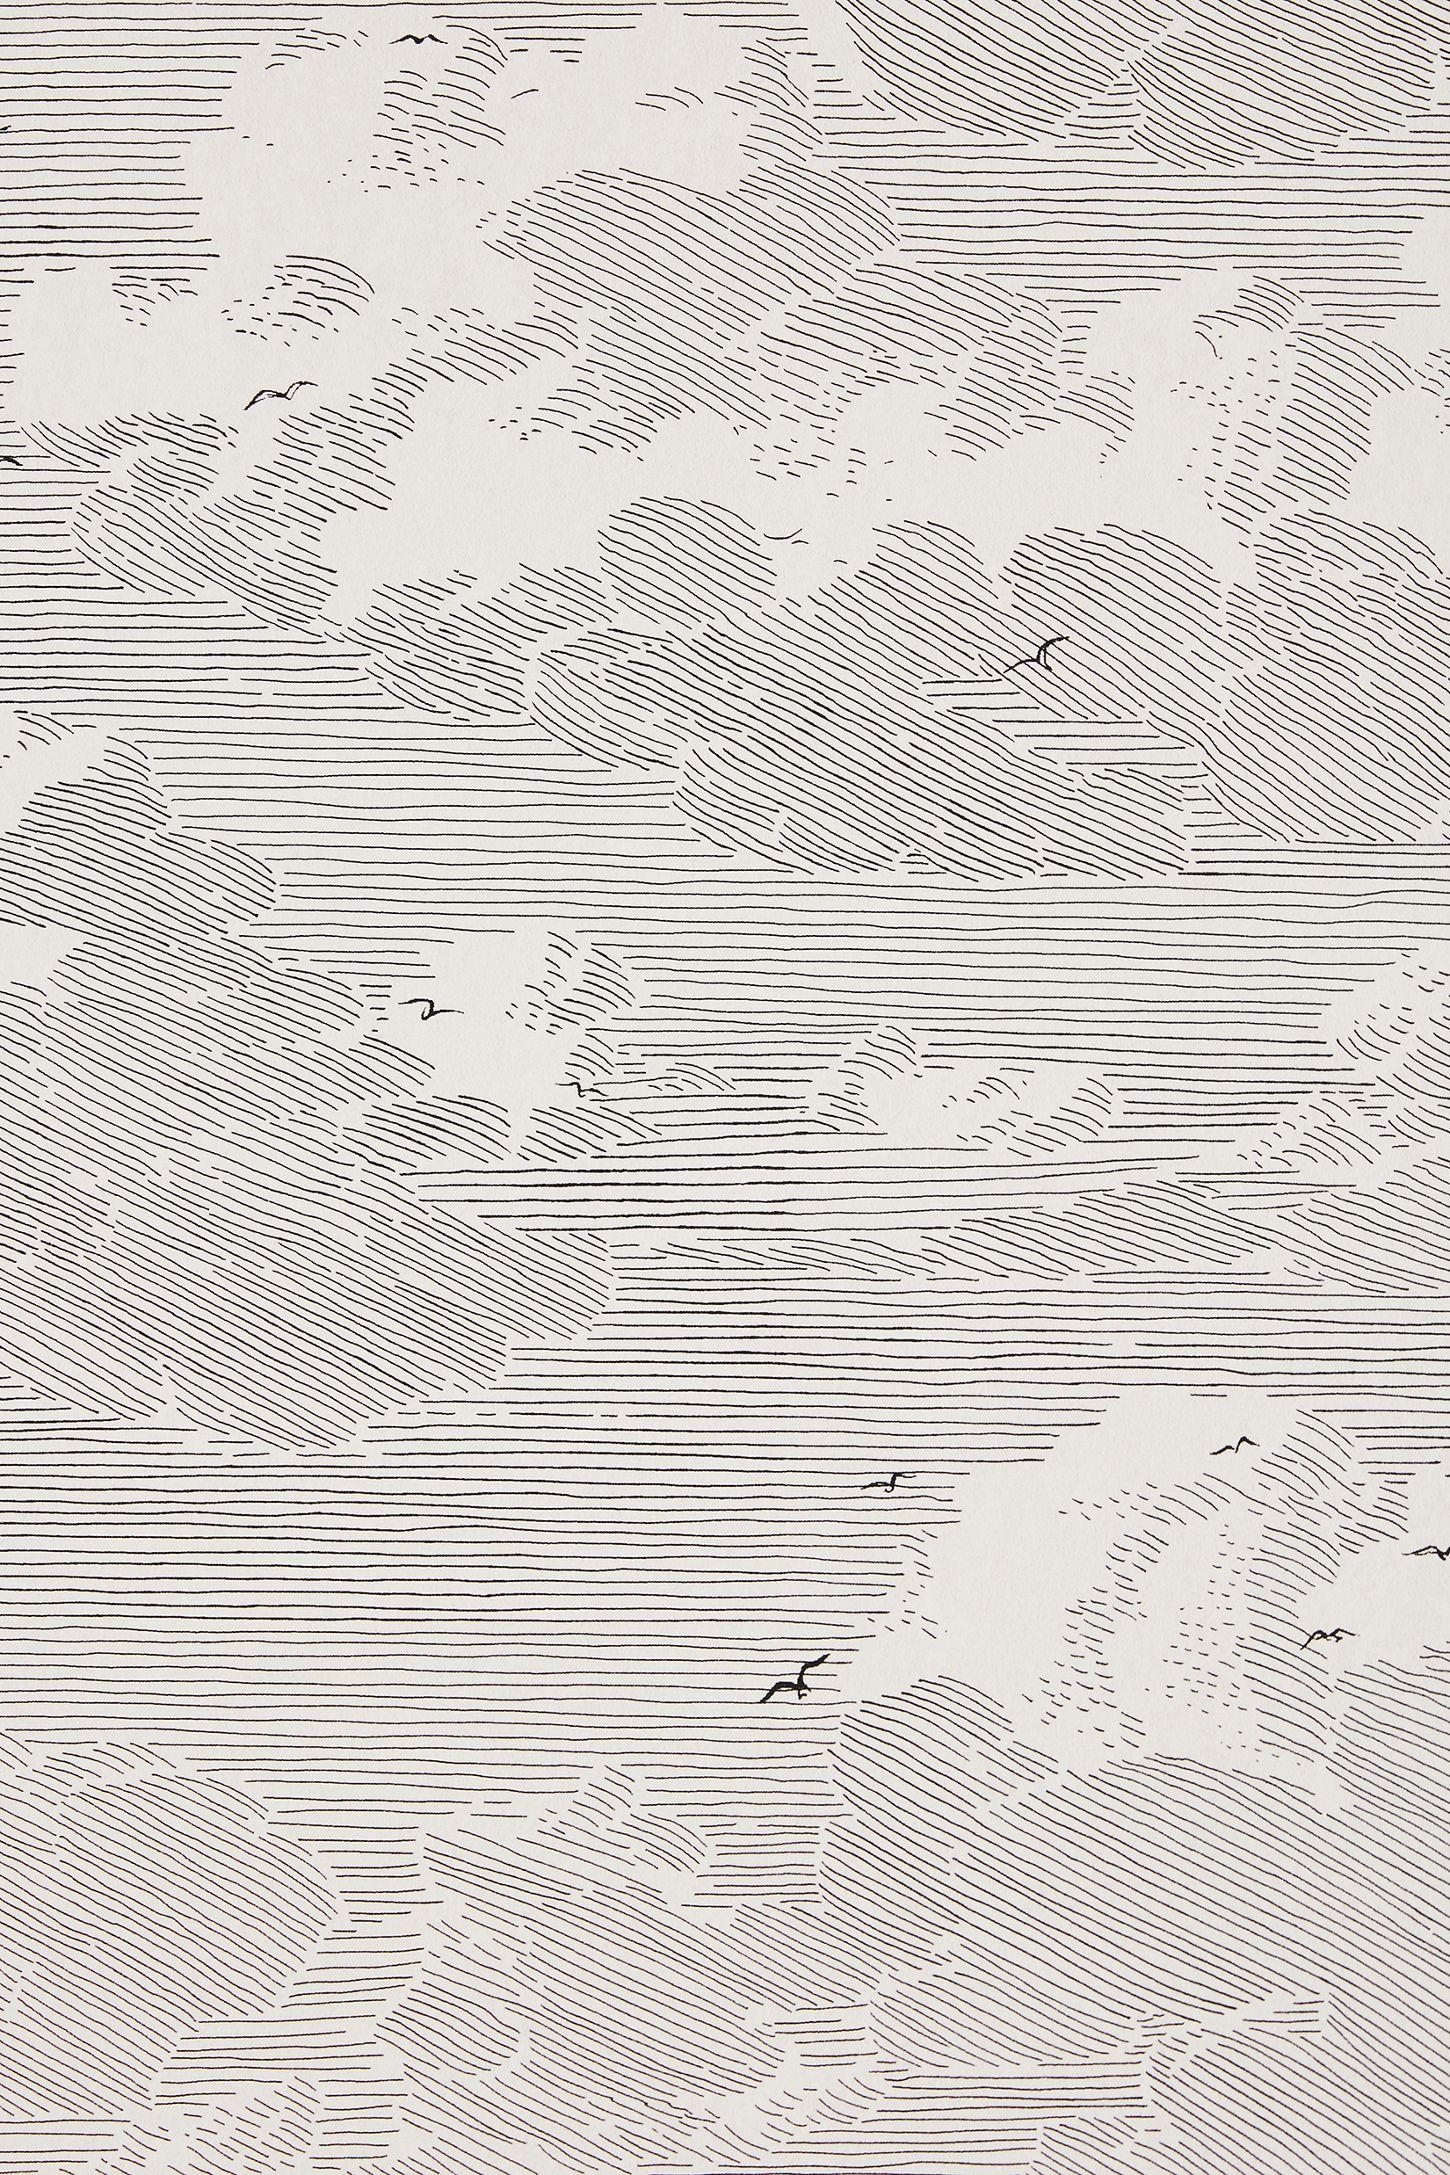 Cloud Formation Wallpaper